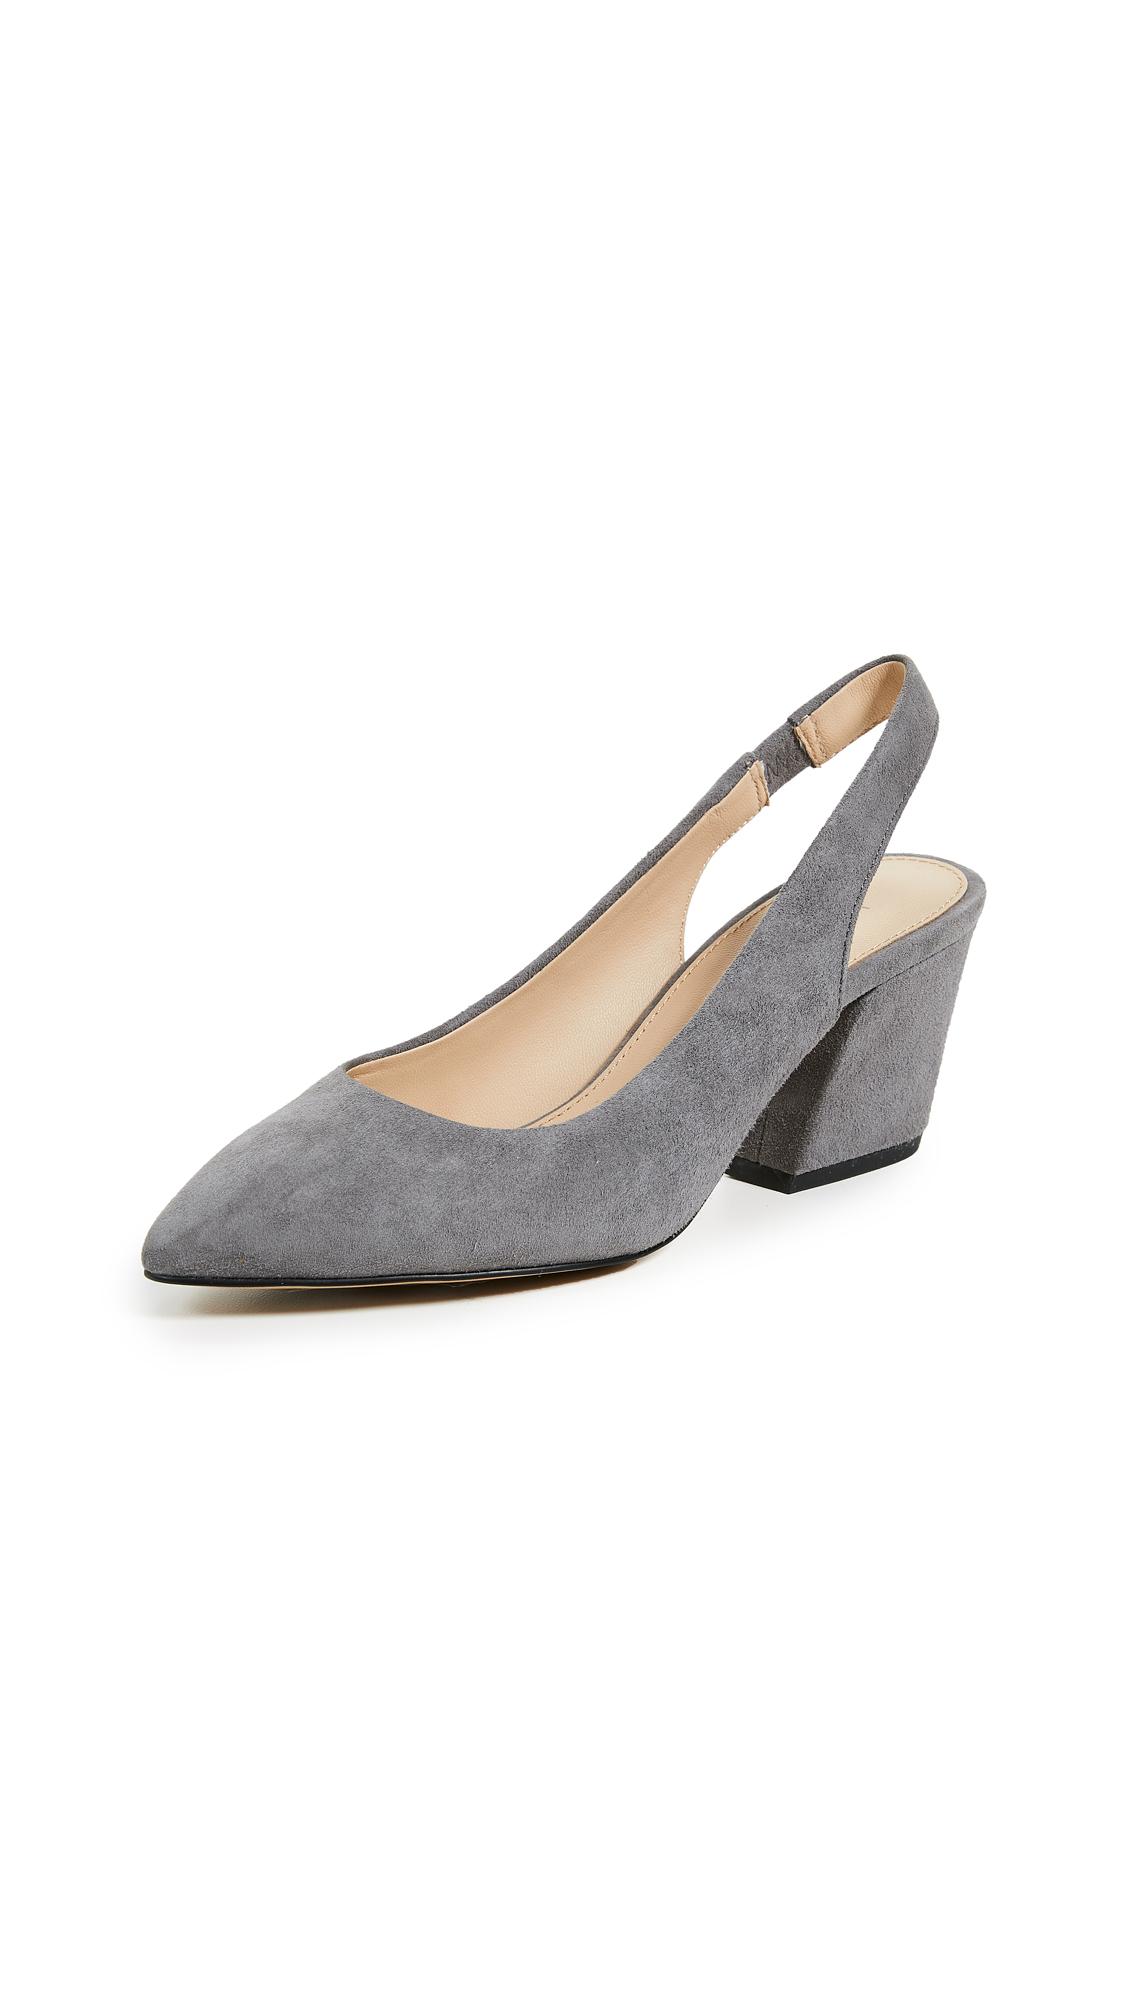 Botkier Shayla Slingback Pumps - French Grey